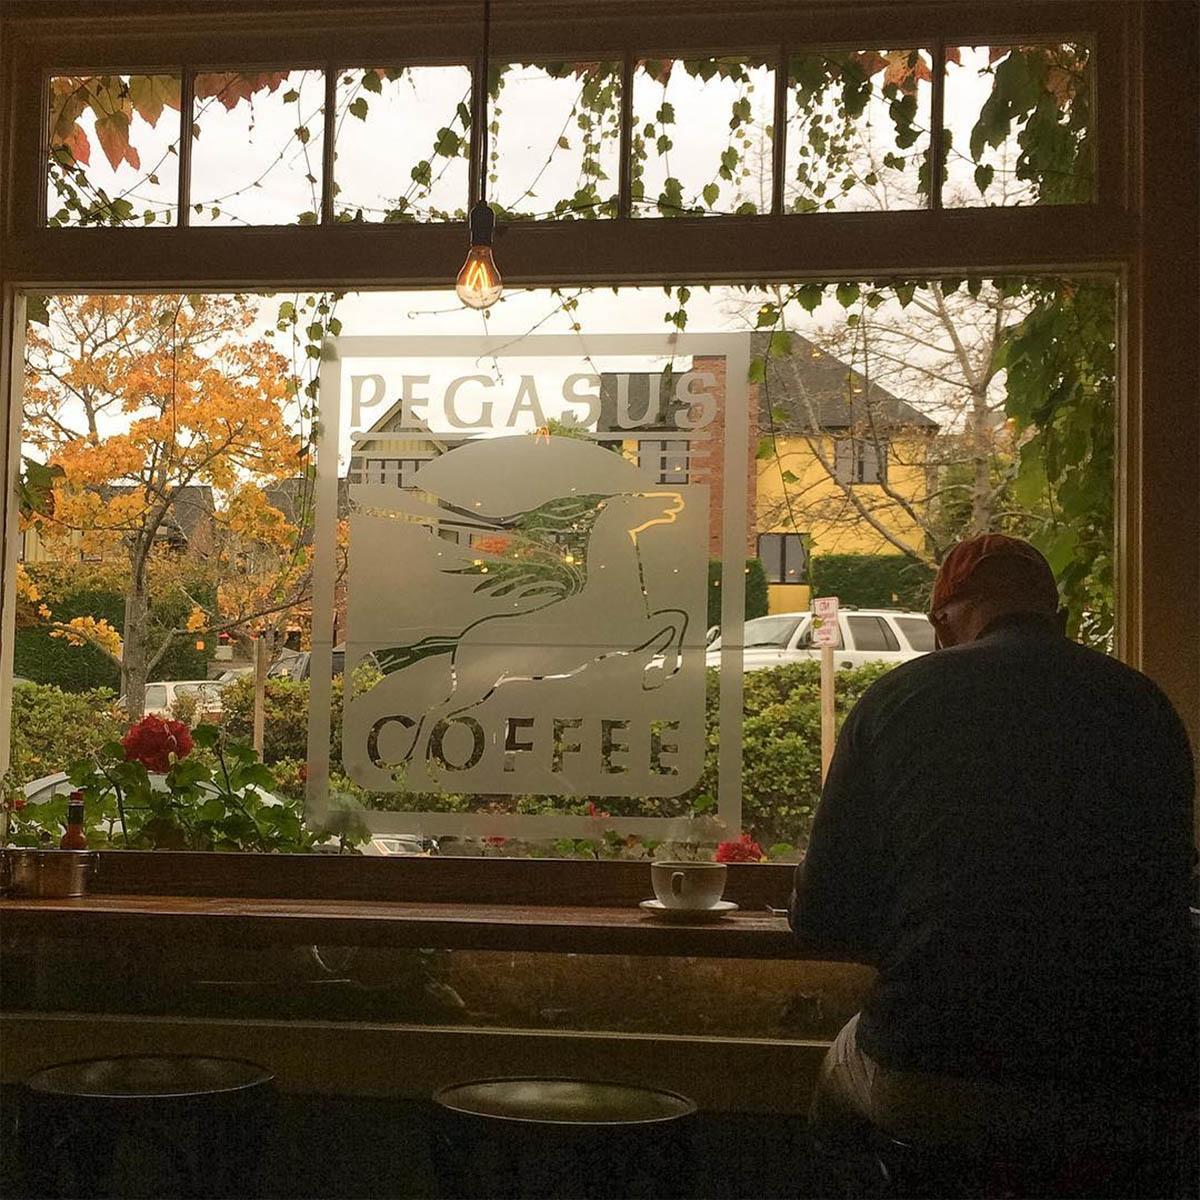 Man sitting in the window of a coffee shop on bainbridge island.